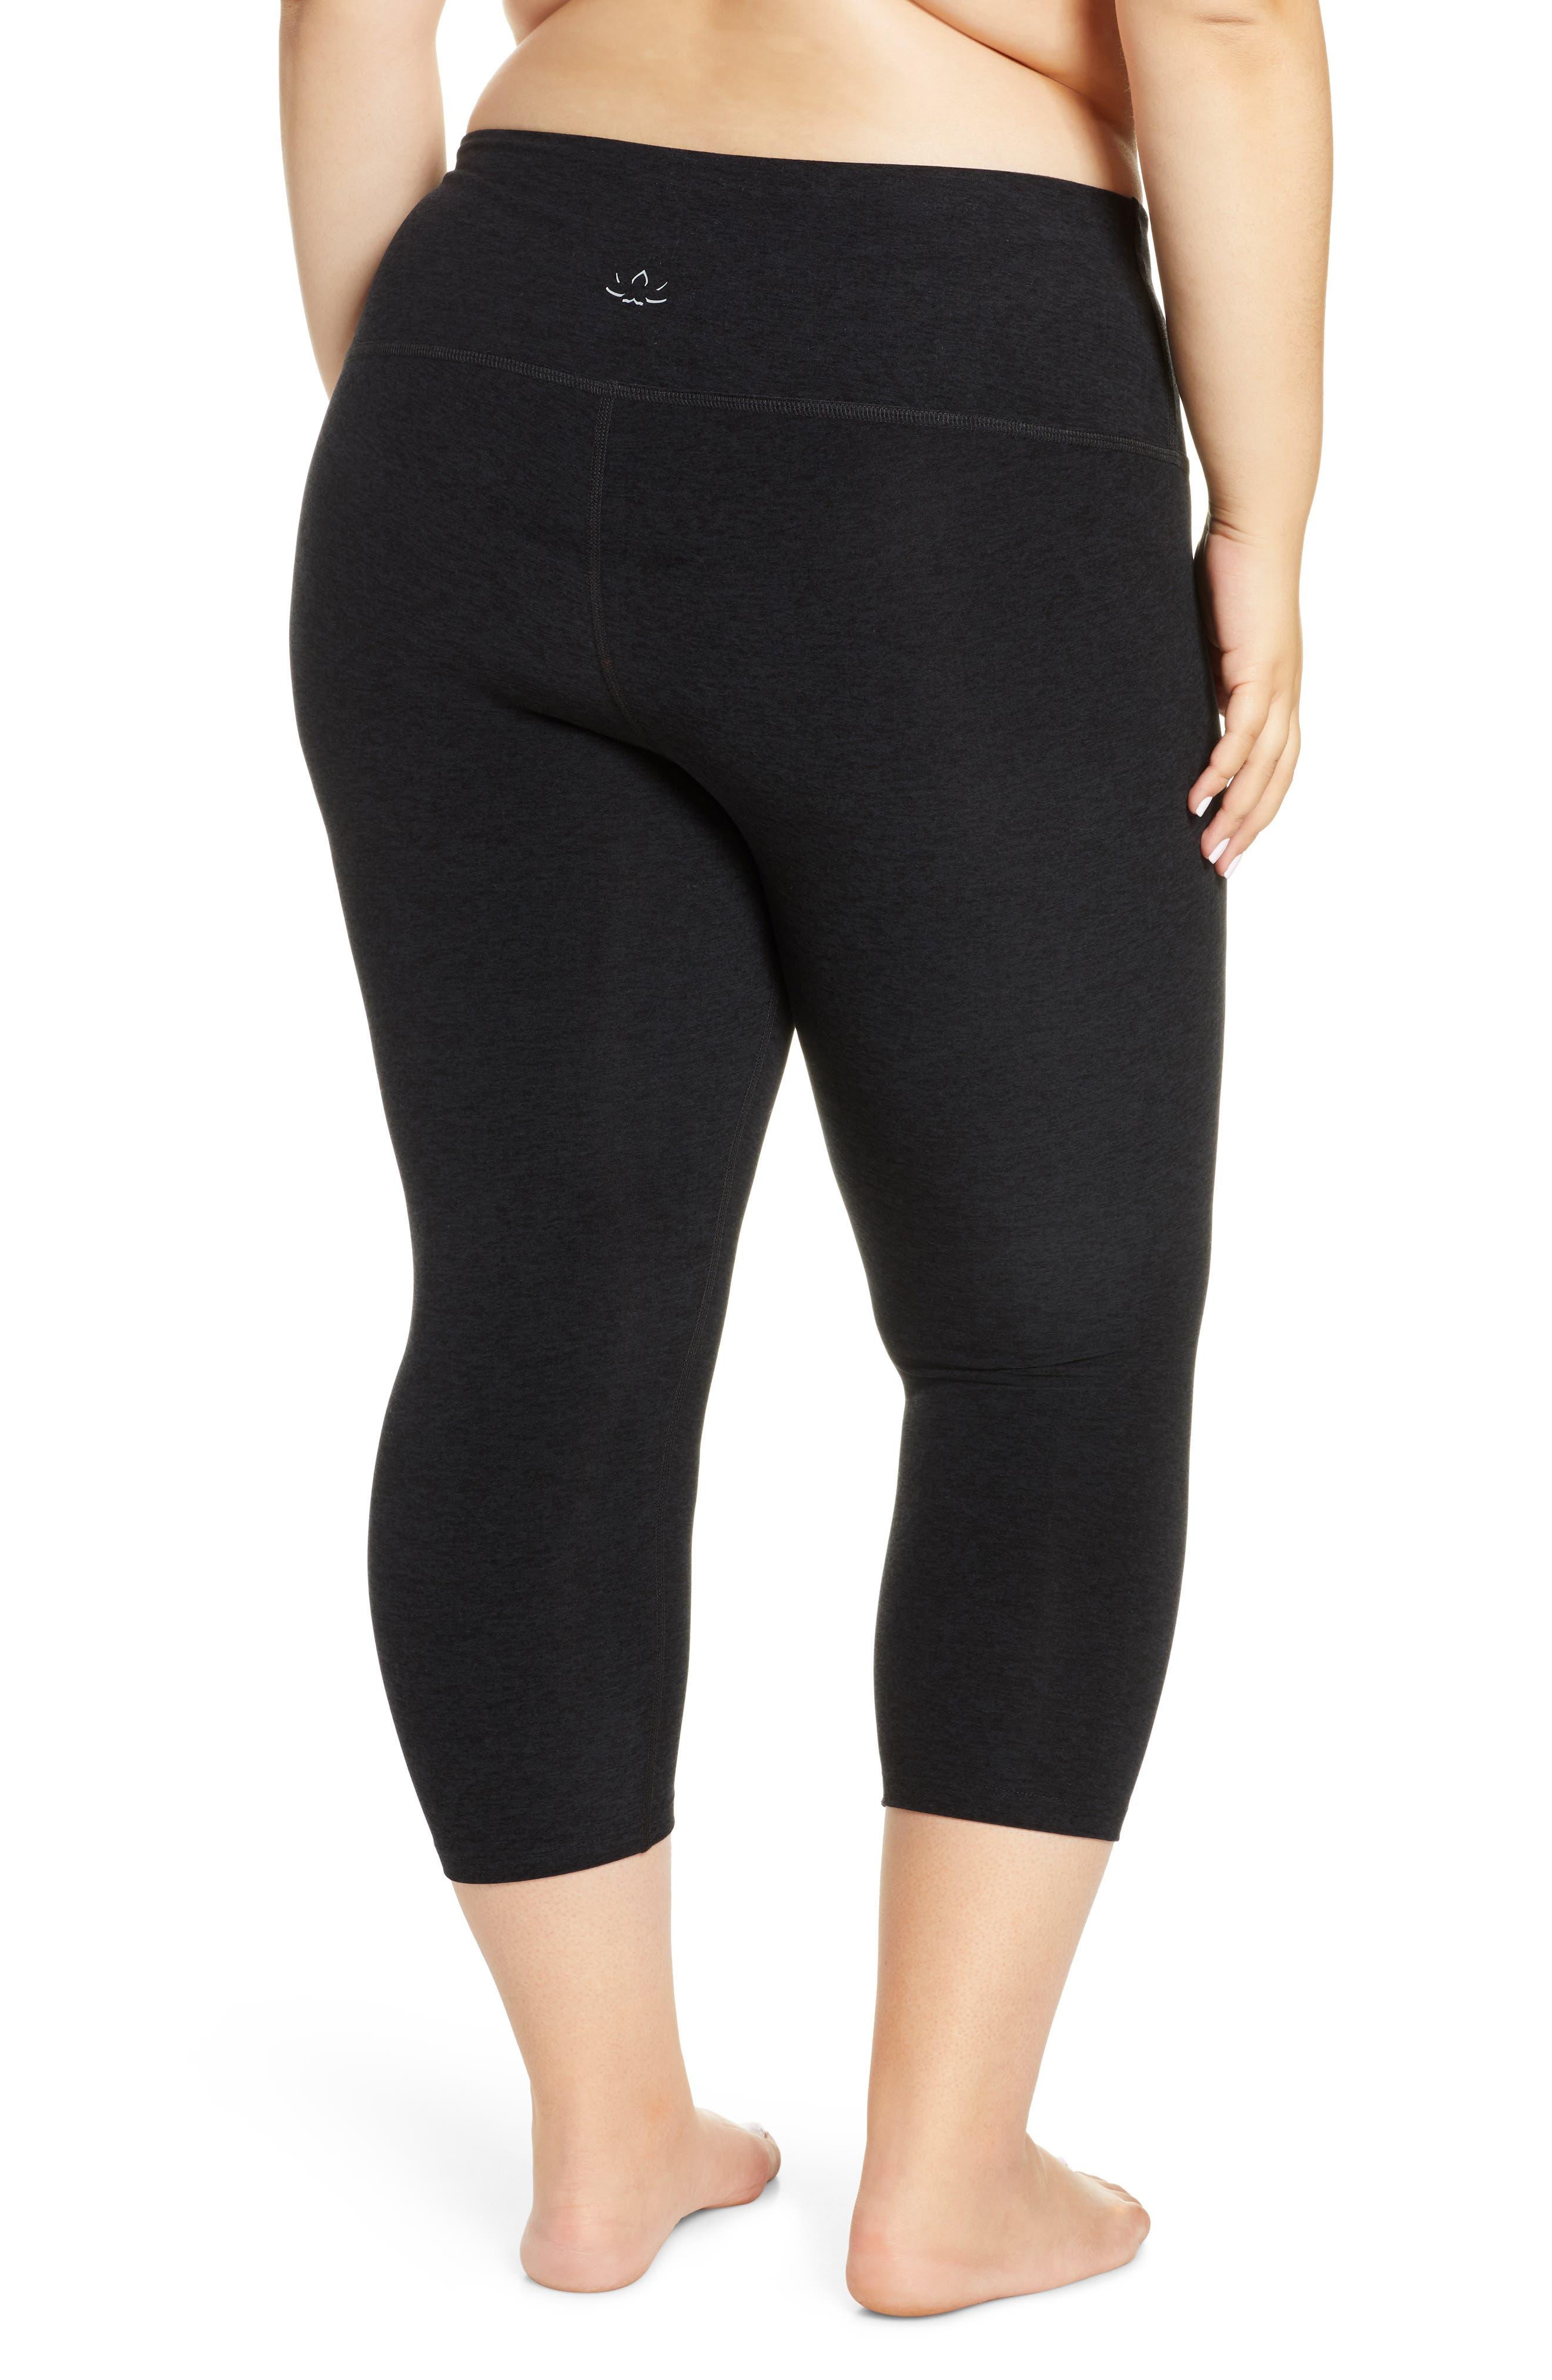 0286e9f89551f Women's Beyond Yoga Clothing | Nordstrom